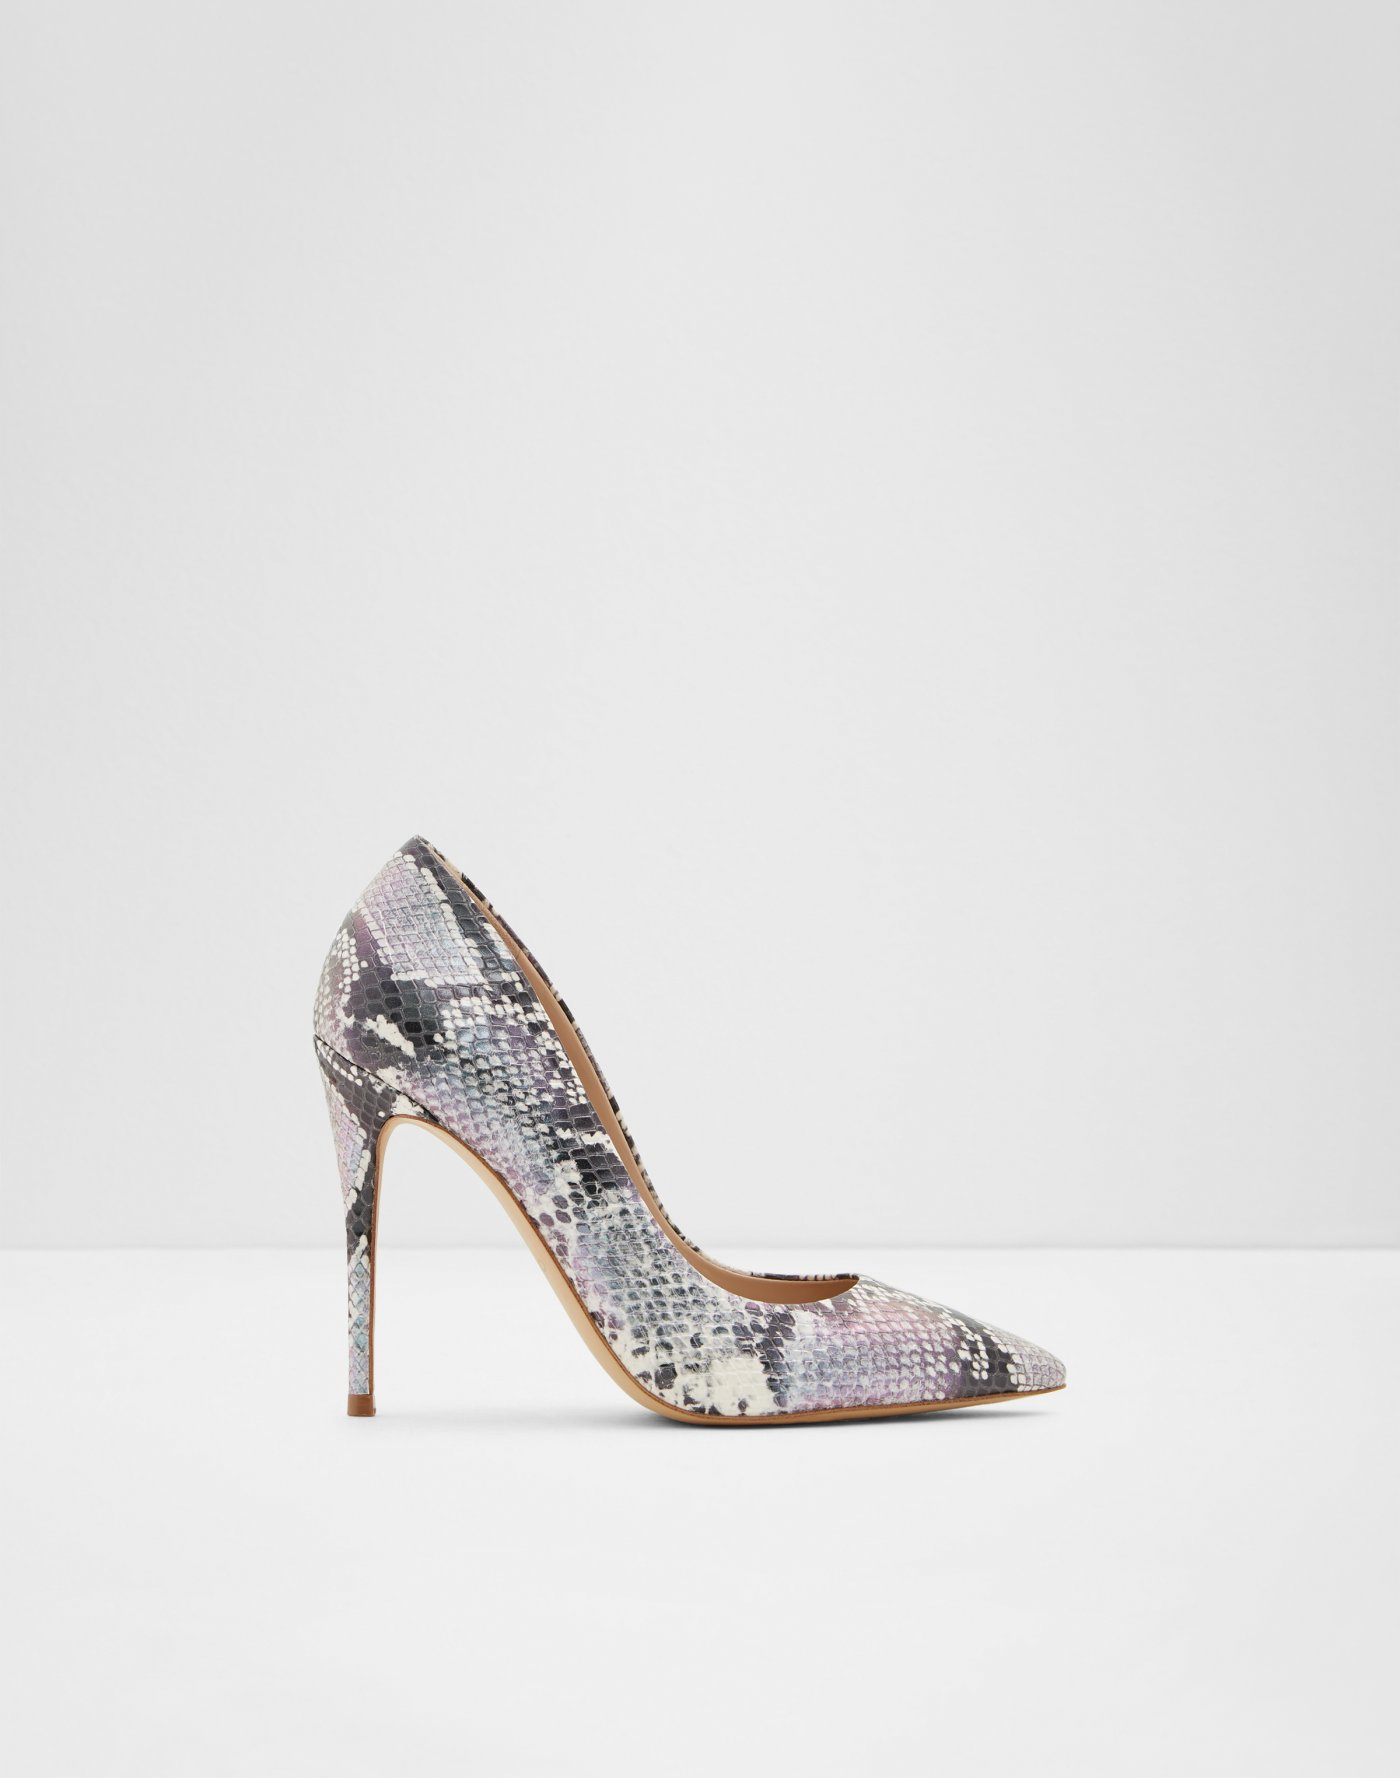 f6d65b9b3144c Women's Heels | Black, Red, Nude, Silver Heels | ALDO US | Aldoshoes.com US